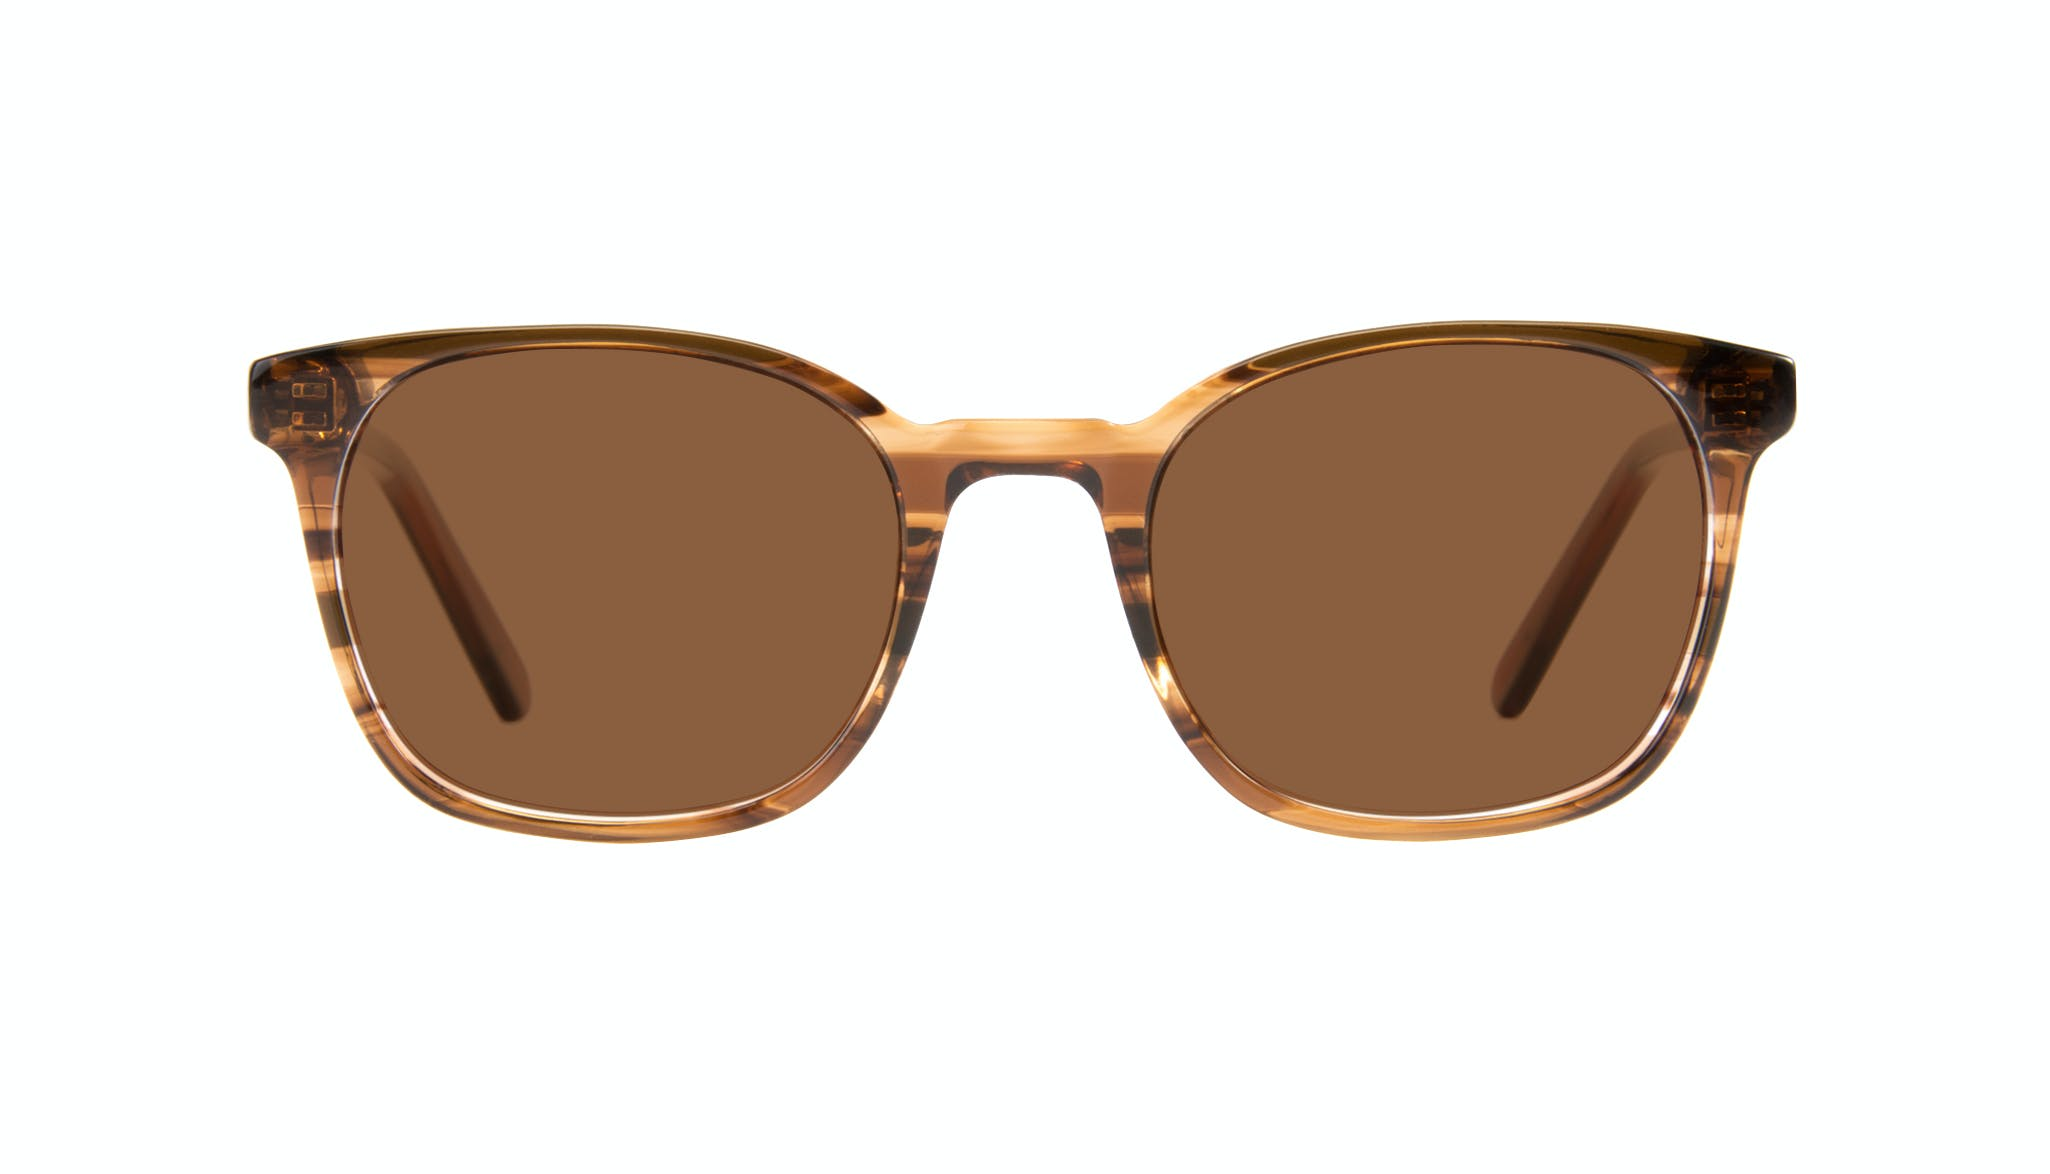 Affordable Fashion Glasses Rectangle Square Sunglasses Men Peak Wood Front